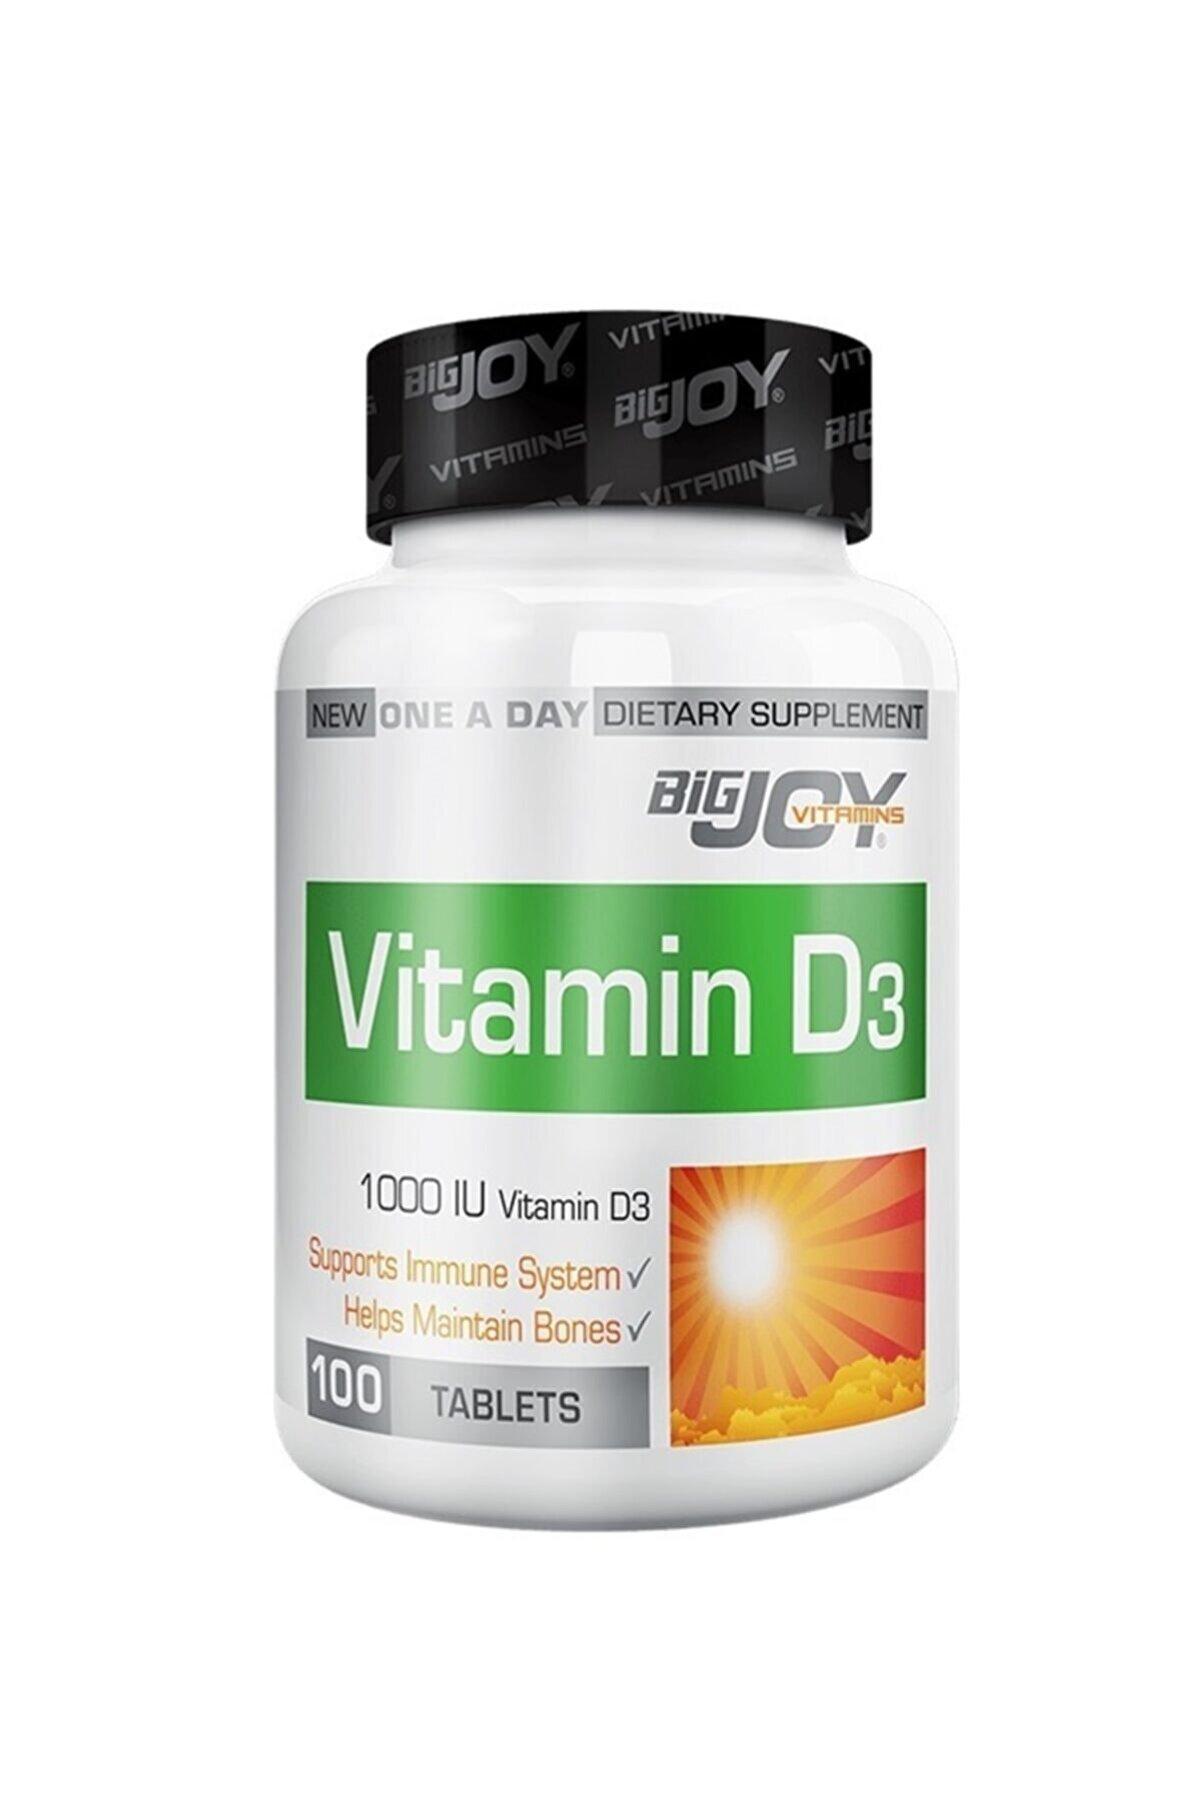 Bigjoy Sports Bigjoy Vitamins Vitamin D3 1000 Iu - 100 Tablet